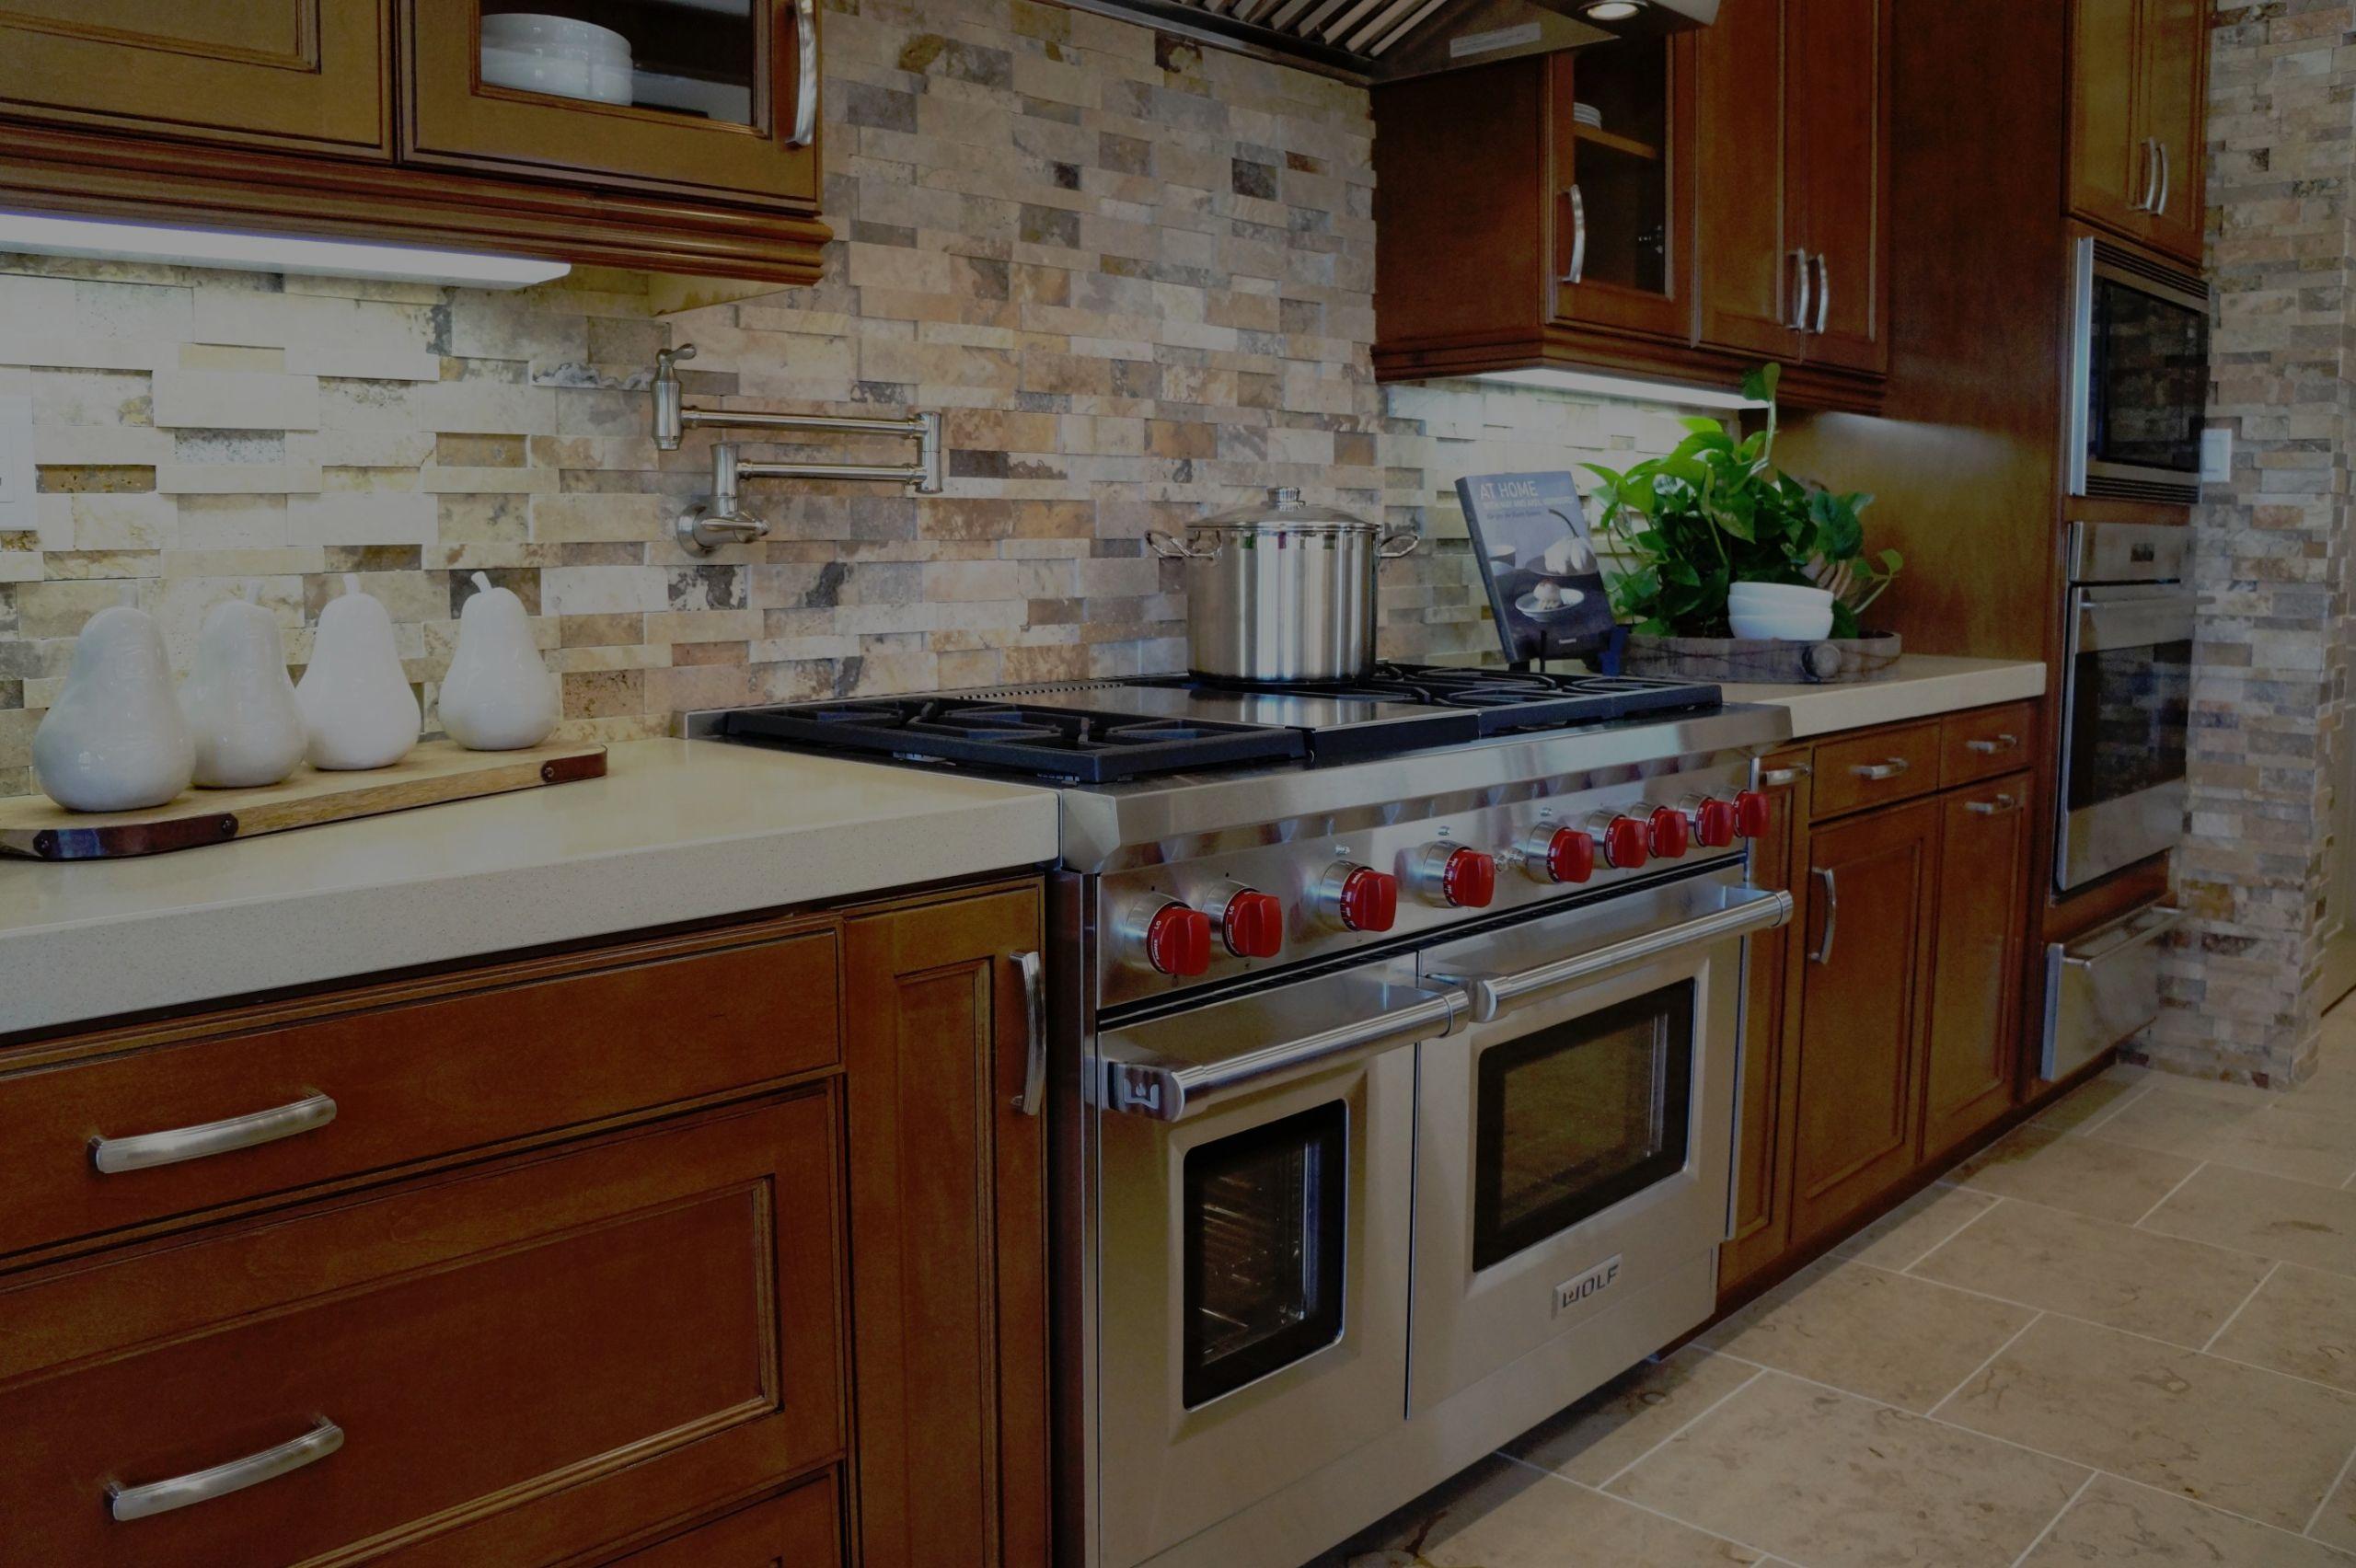 Houzz 2018 Kitchen Trends Study | Inman News Story | Bruce Clark Homes